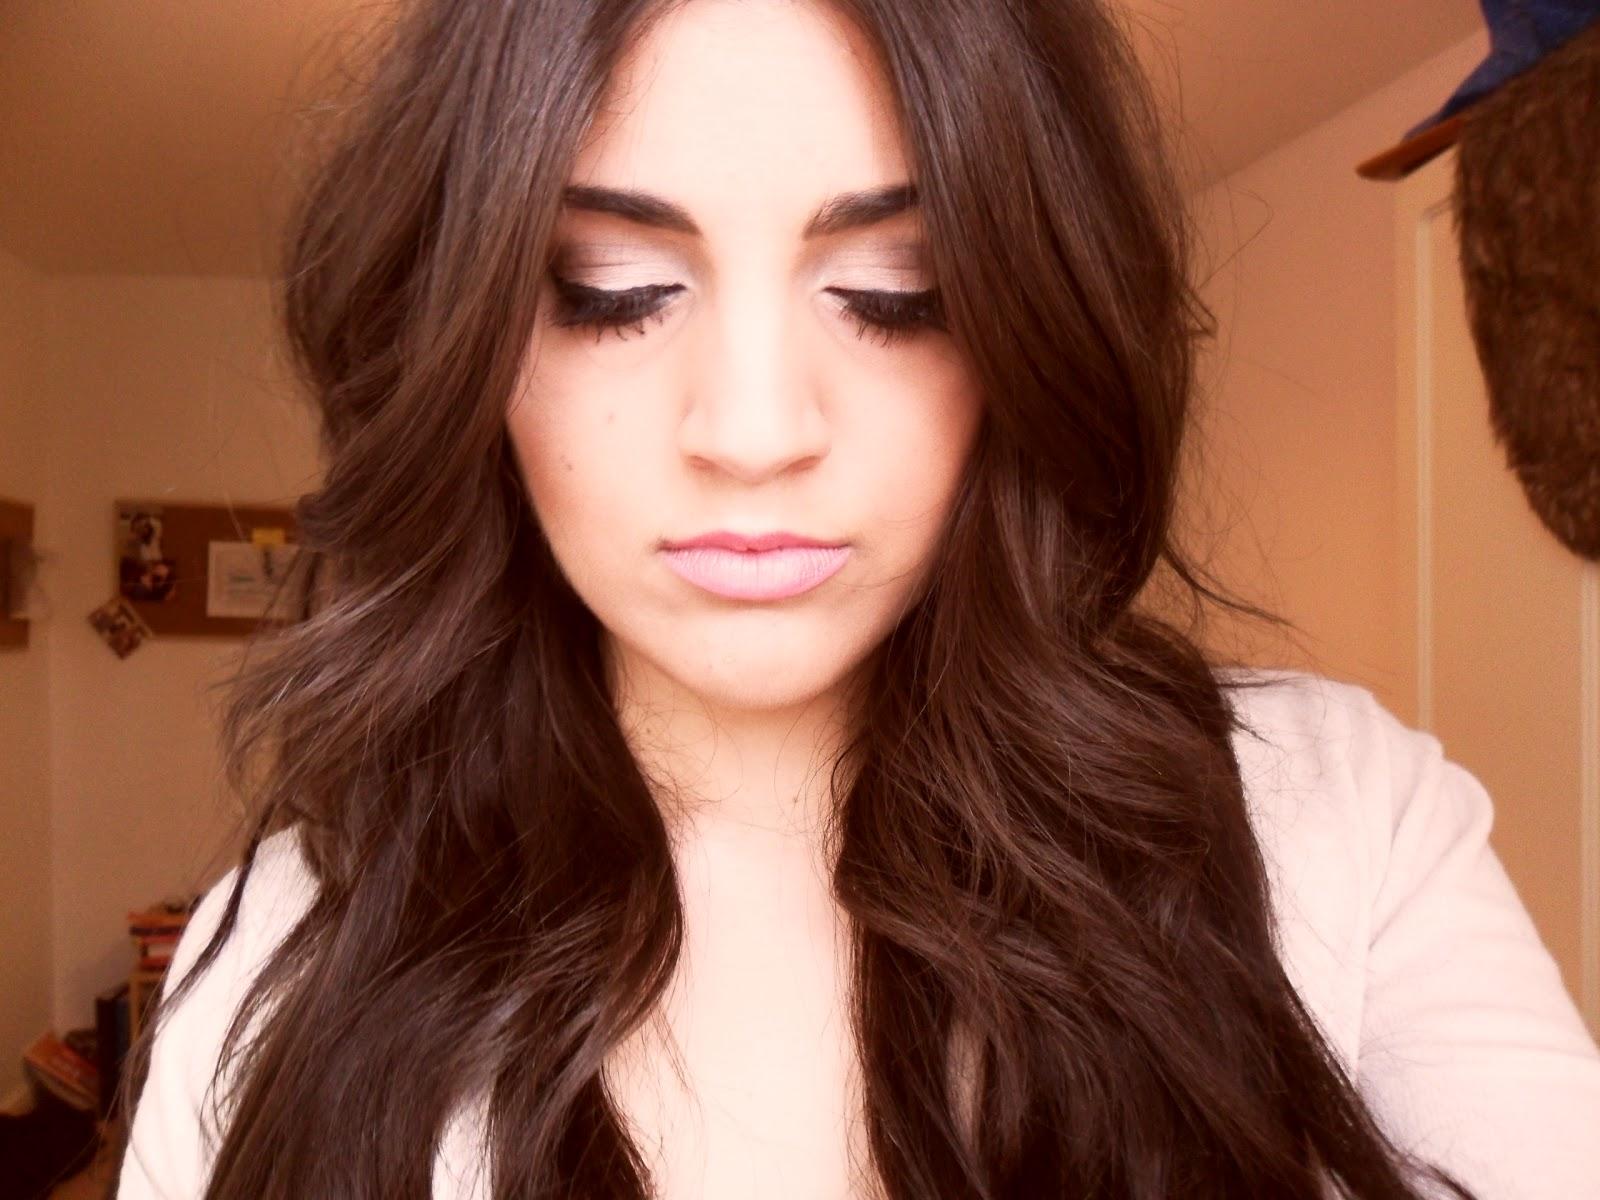 Khloe Kardashian Hair Dark On Top Light On Bottom Khloe kardashian    Khloe Kardashian Hair Dark On Top Light On Bottom